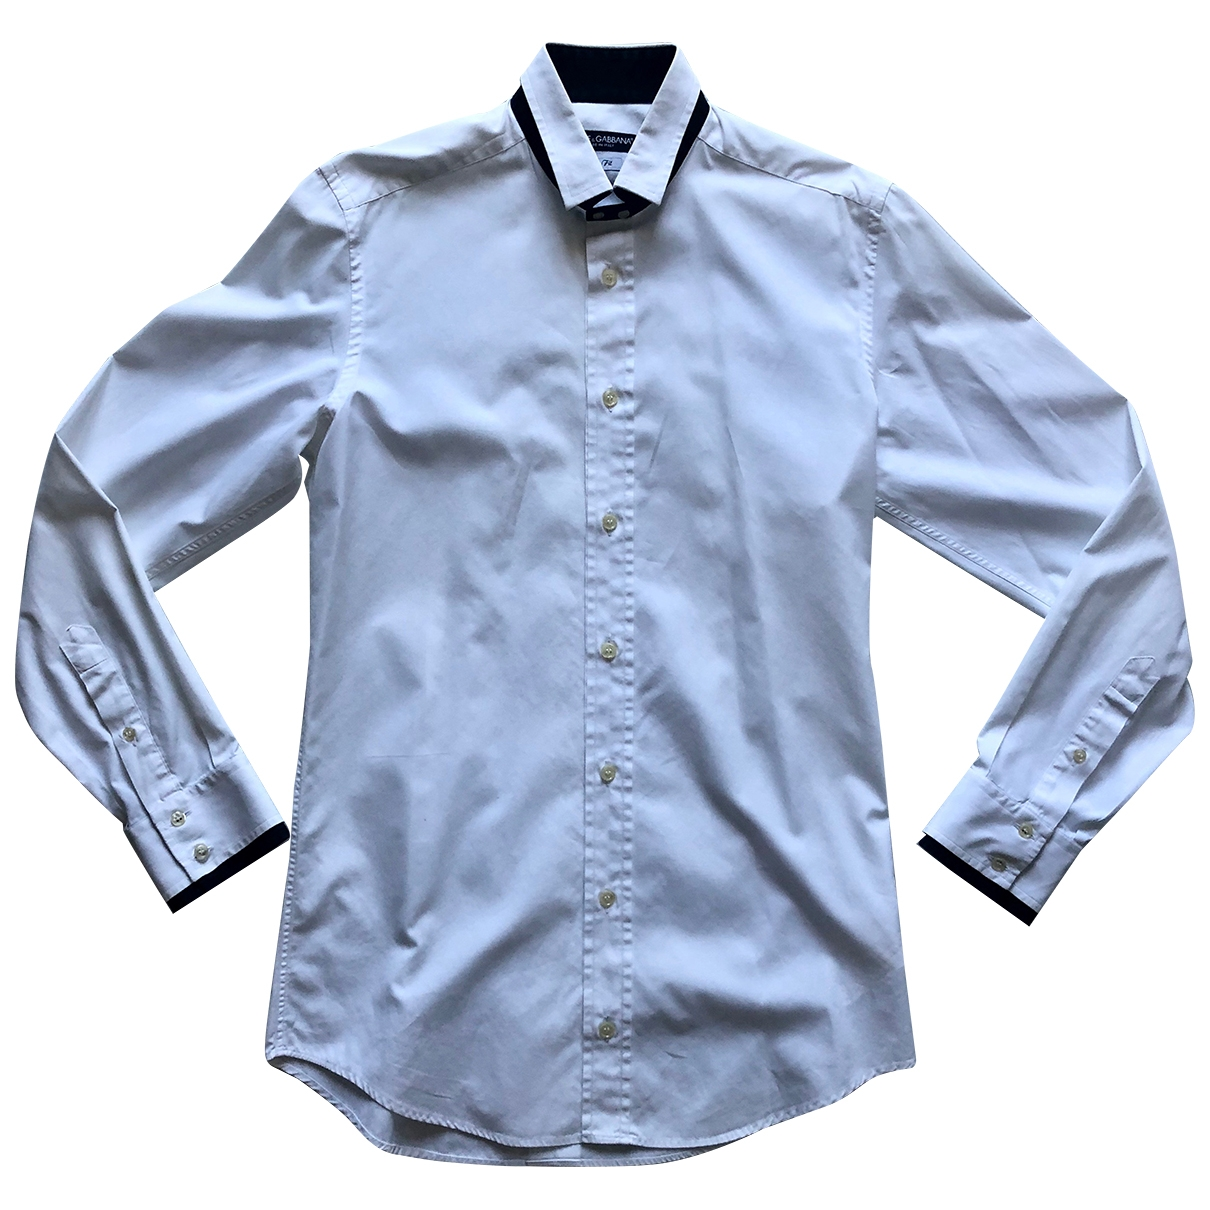 Dolce & Gabbana \N White Cotton Shirts for Men 39 EU (tour de cou / collar)